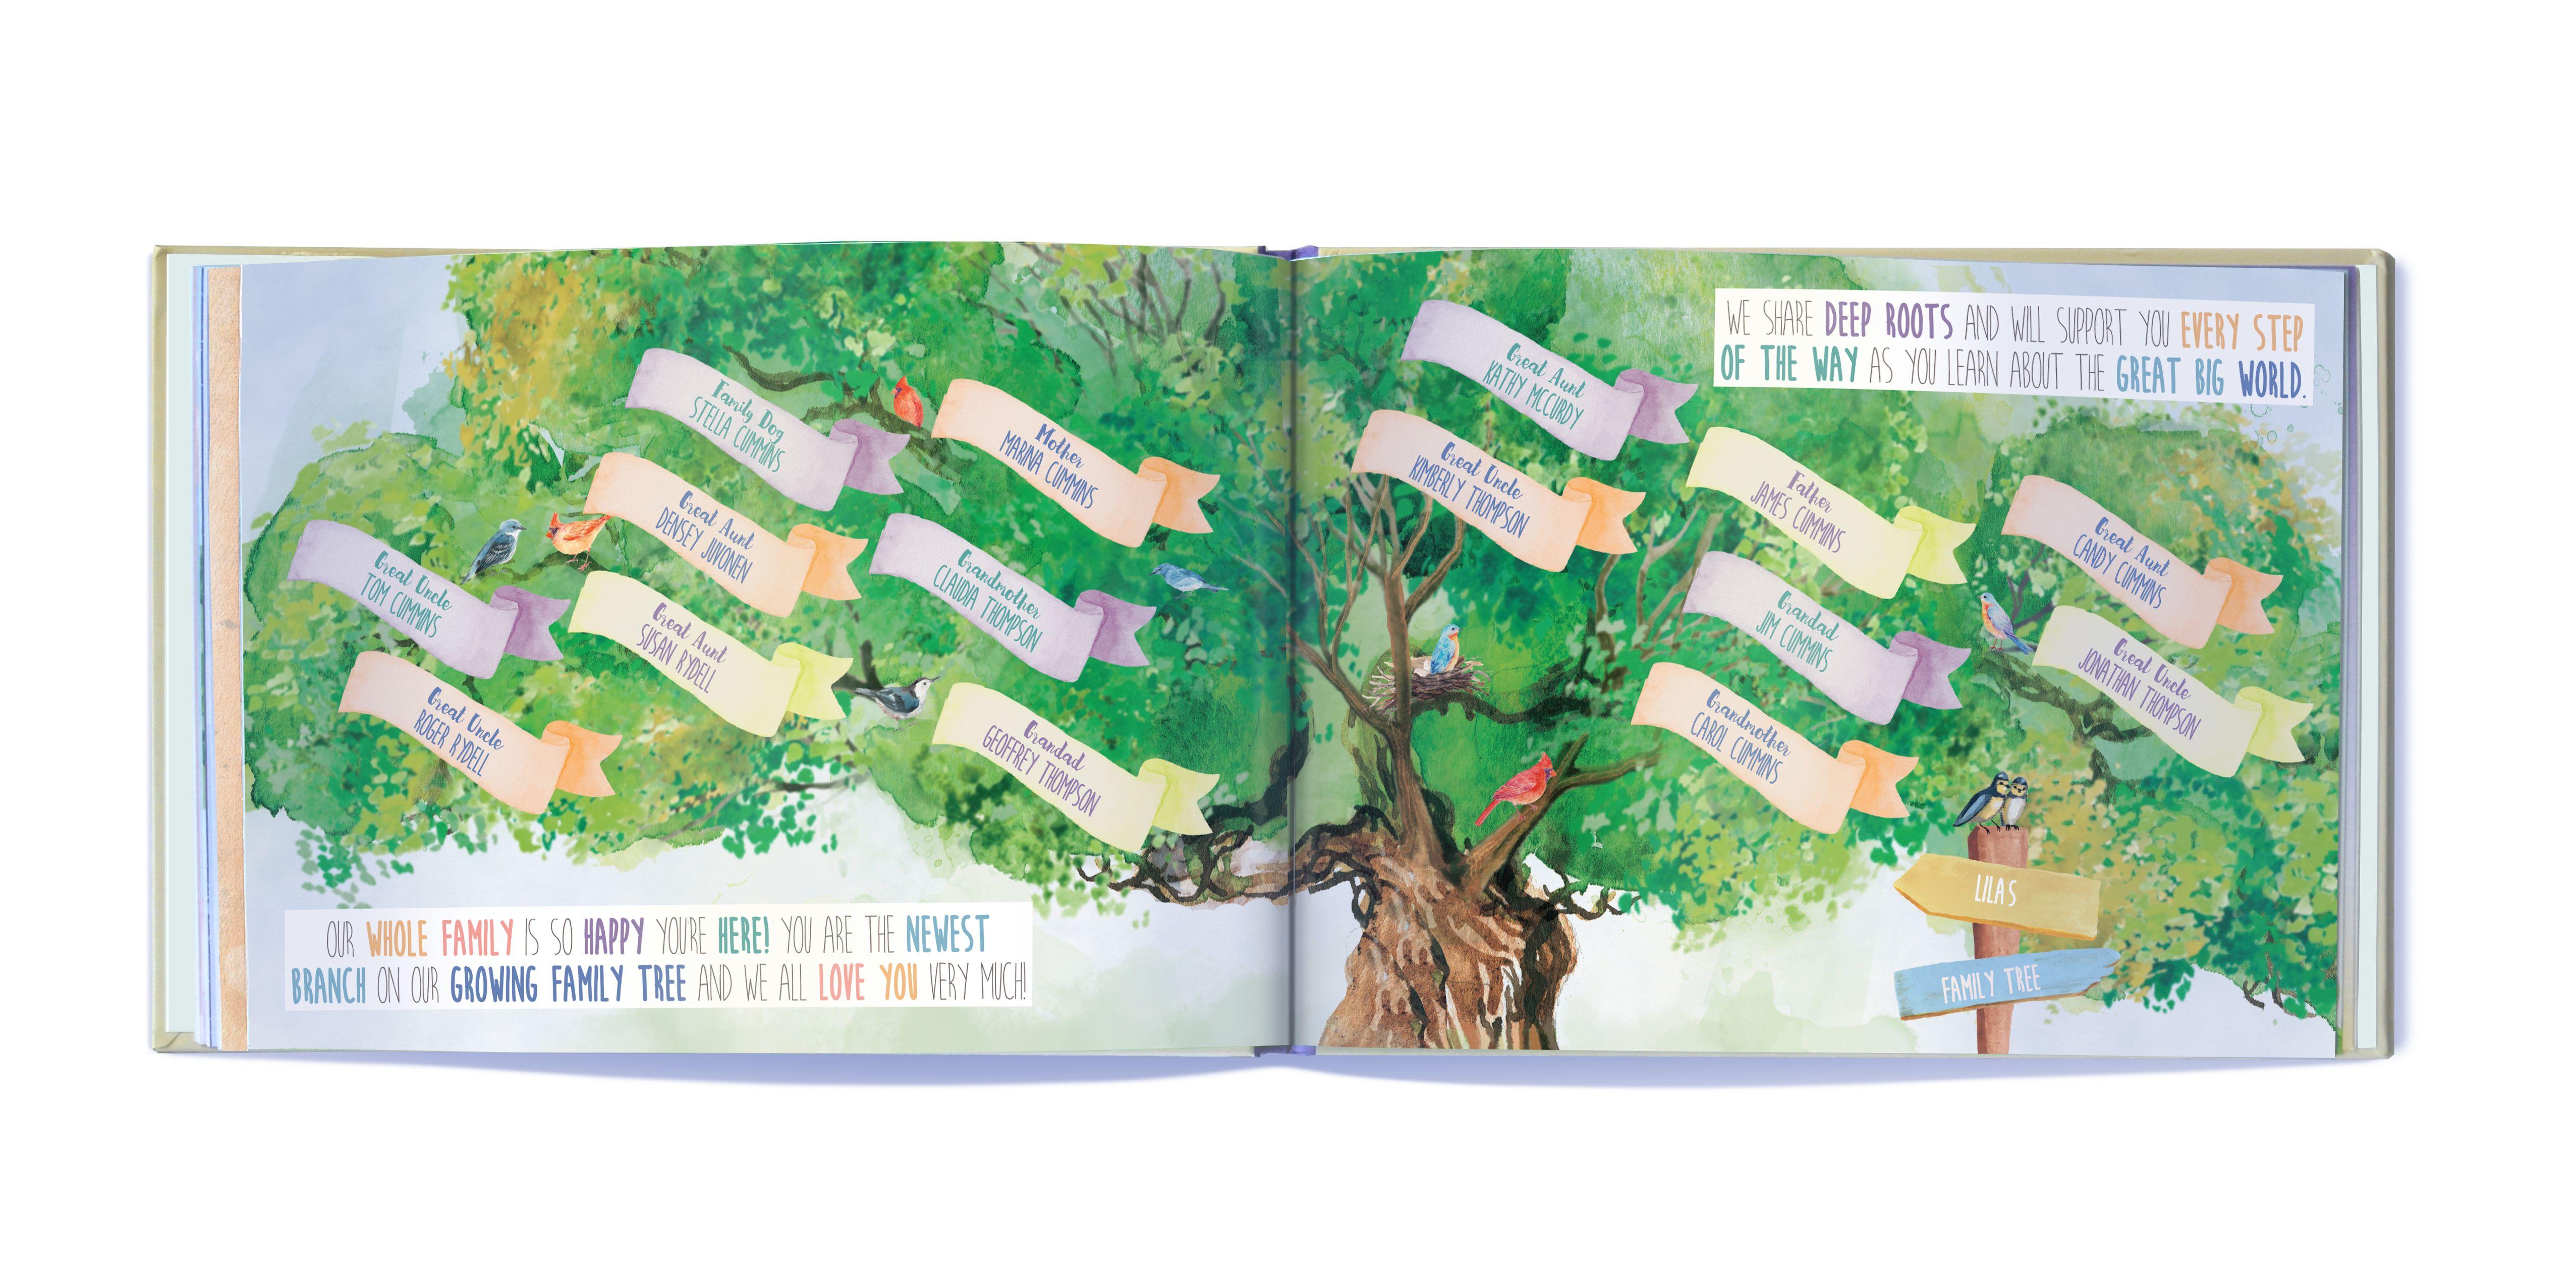 Beautifully illustrated family tree one of many totally